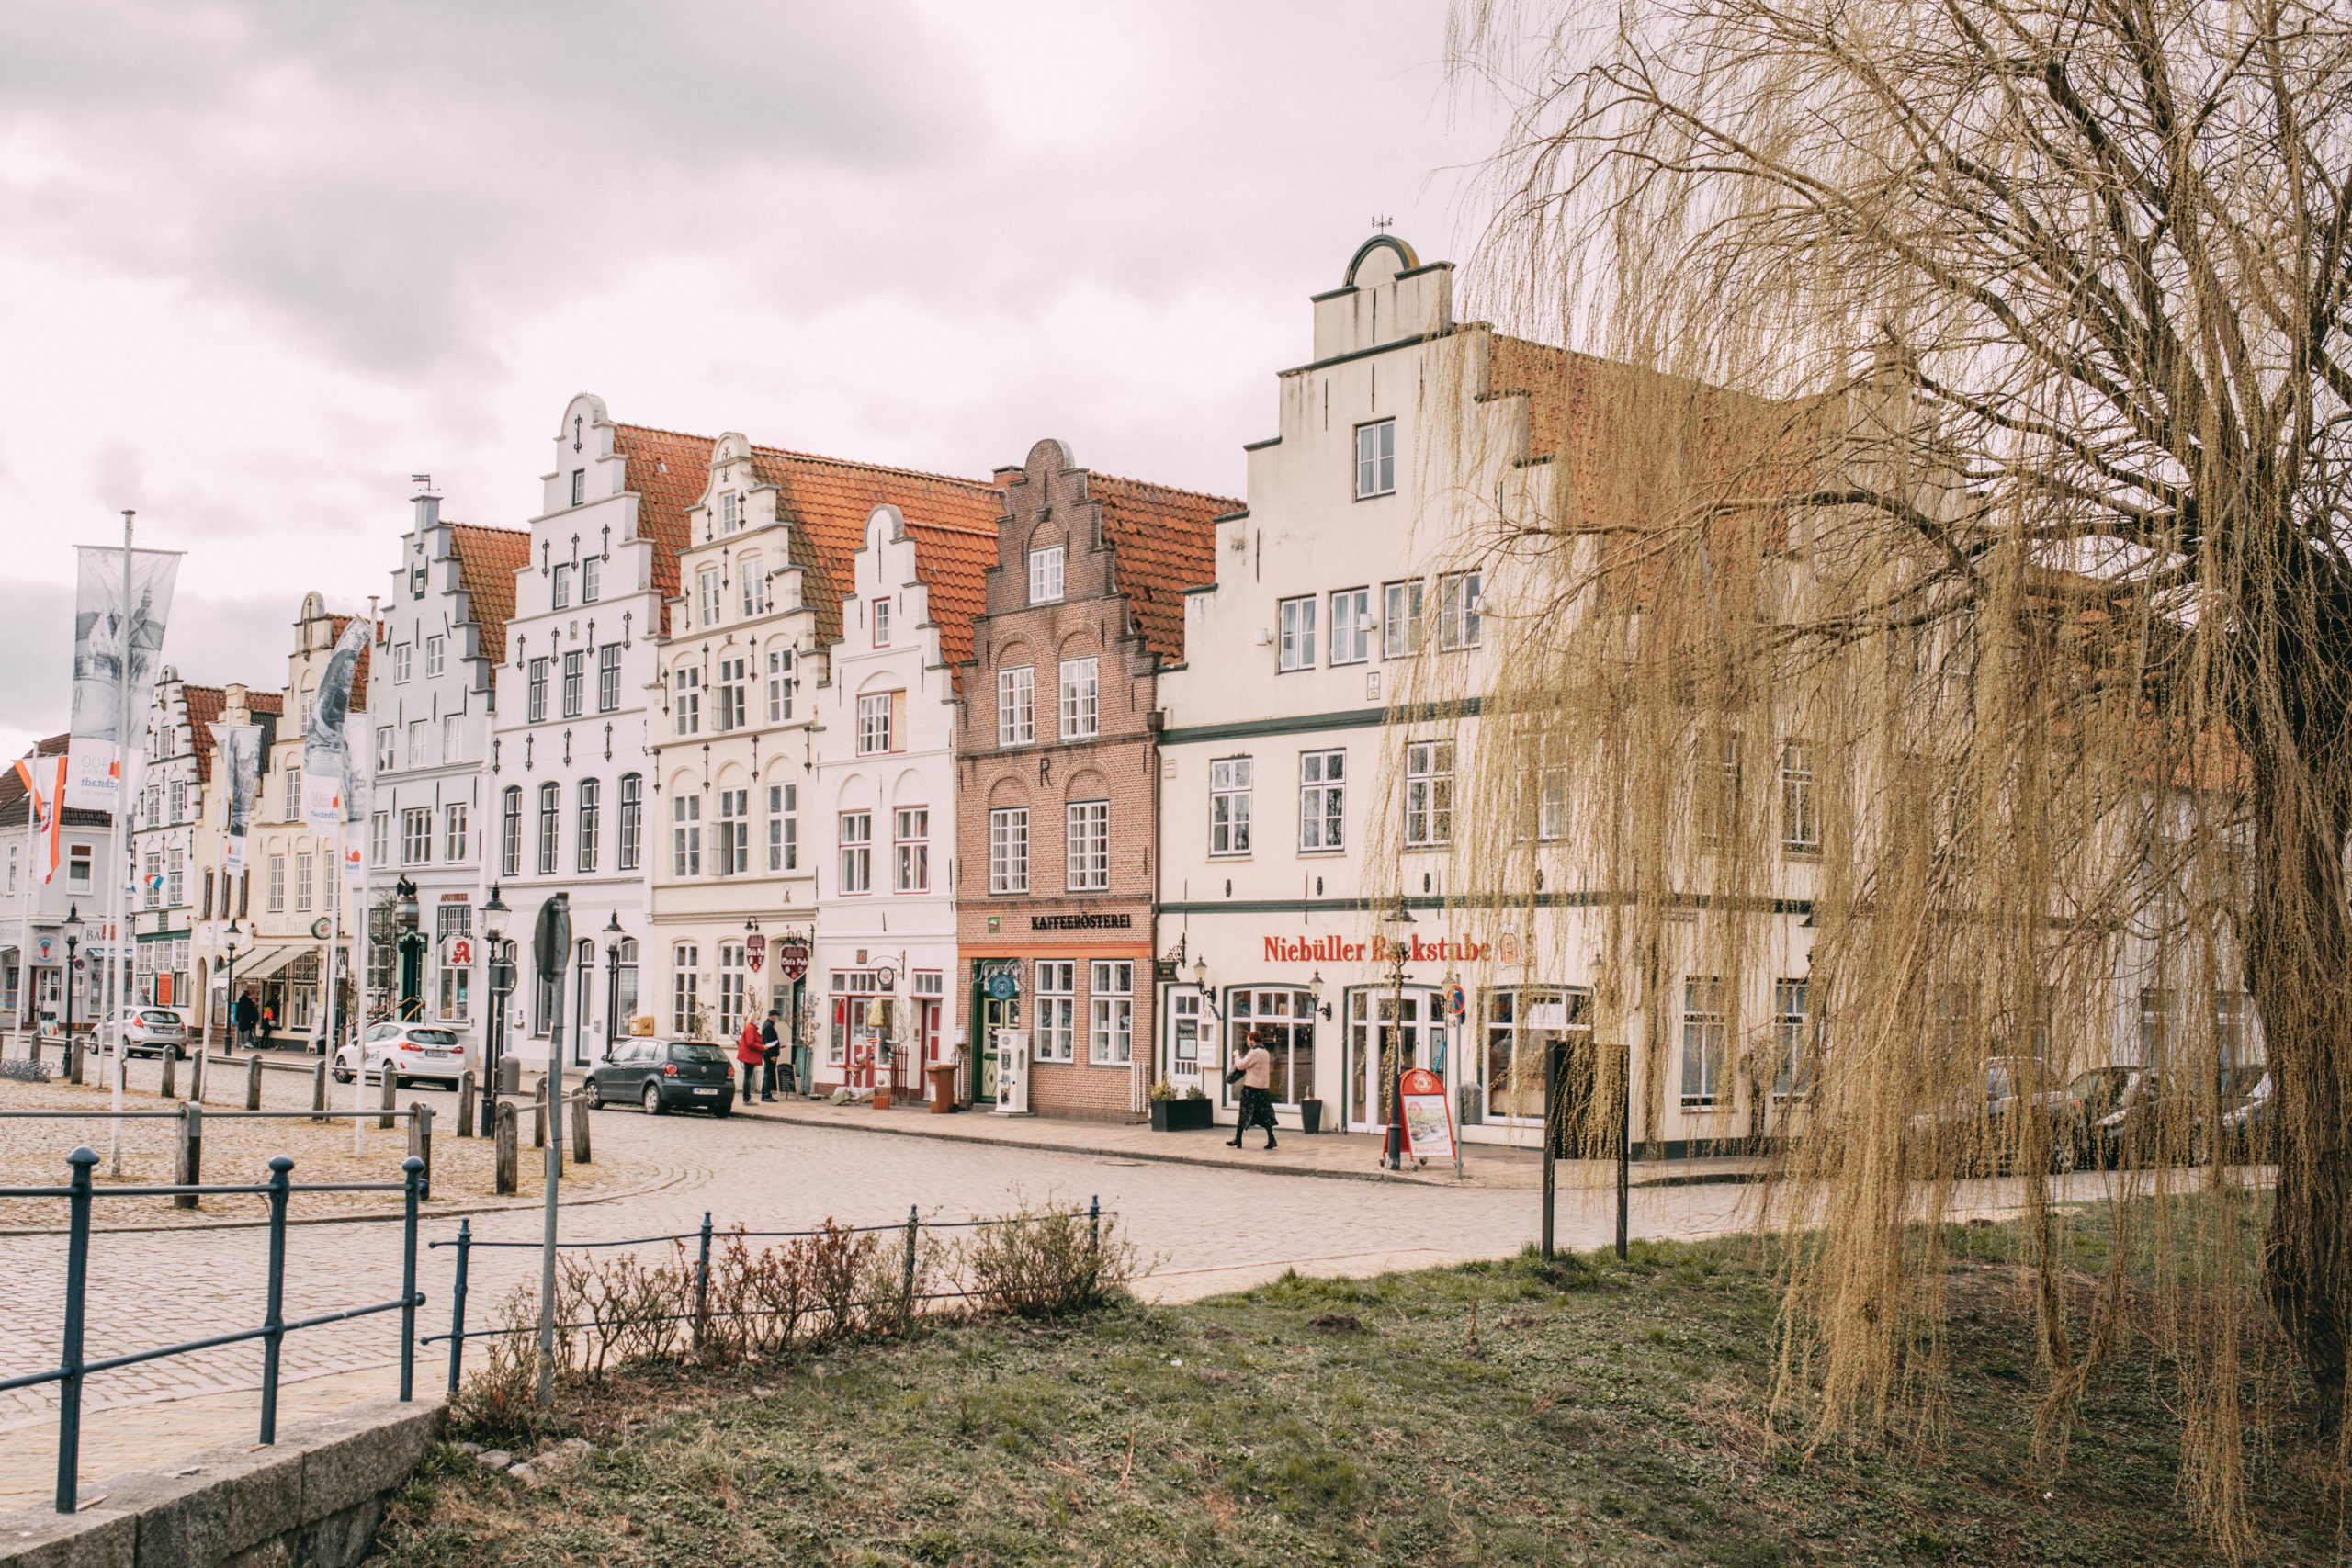 Friedrichstadt Giebelhäuser